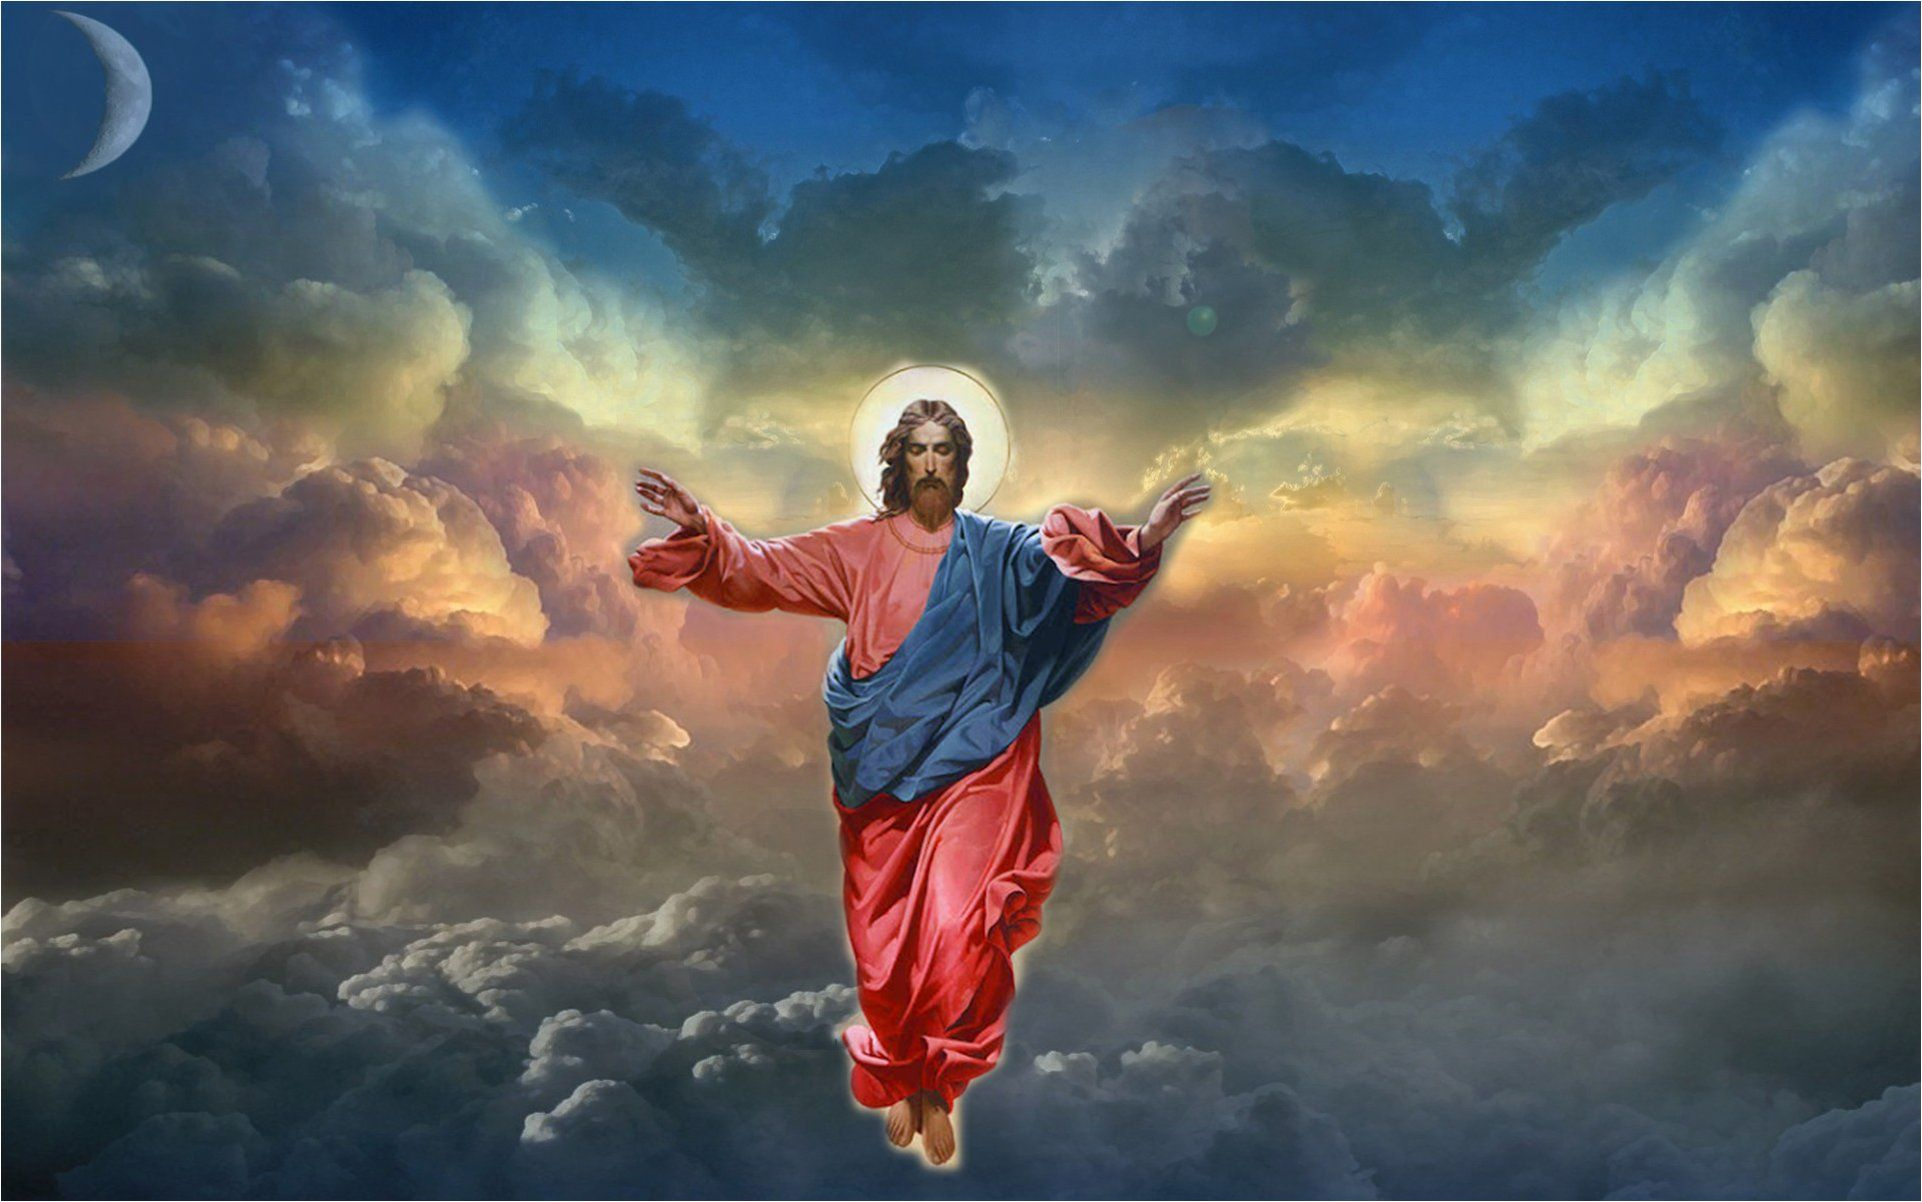 DOWNLOAD | Jesus wallpaper, Ascension of jesus, Jesus pictures